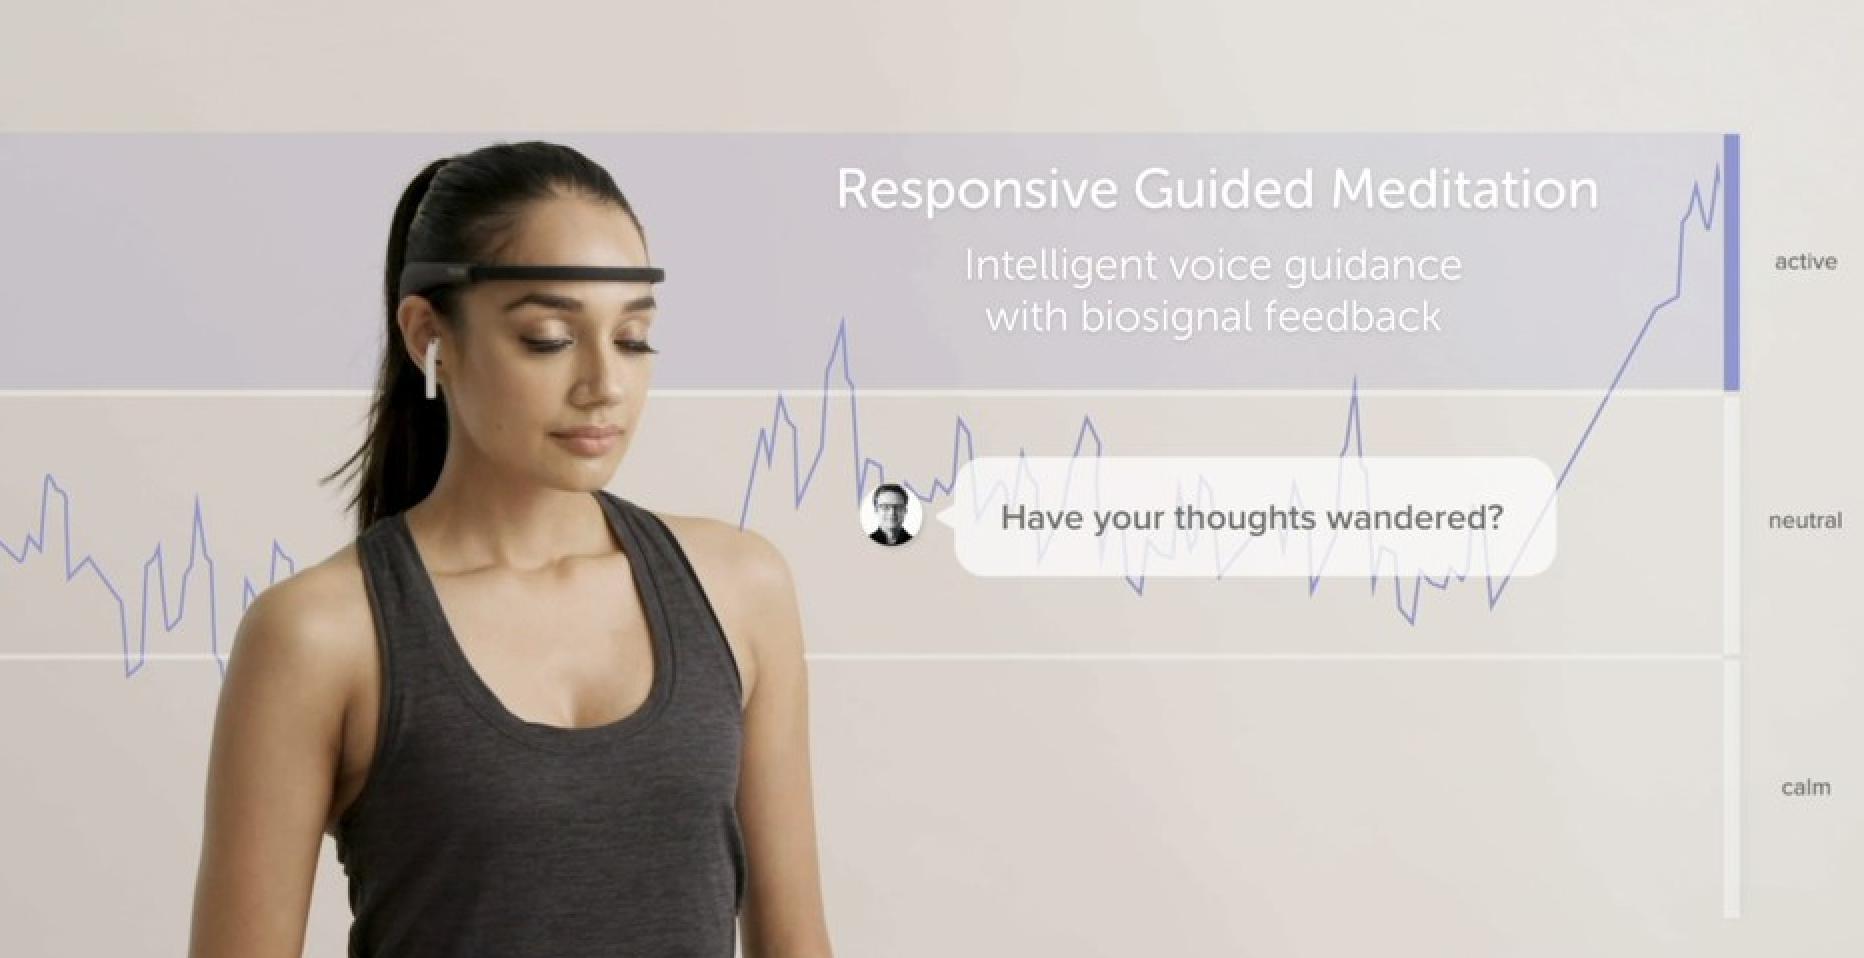 Wellness Inspired Muse Meditation Headpiece and App